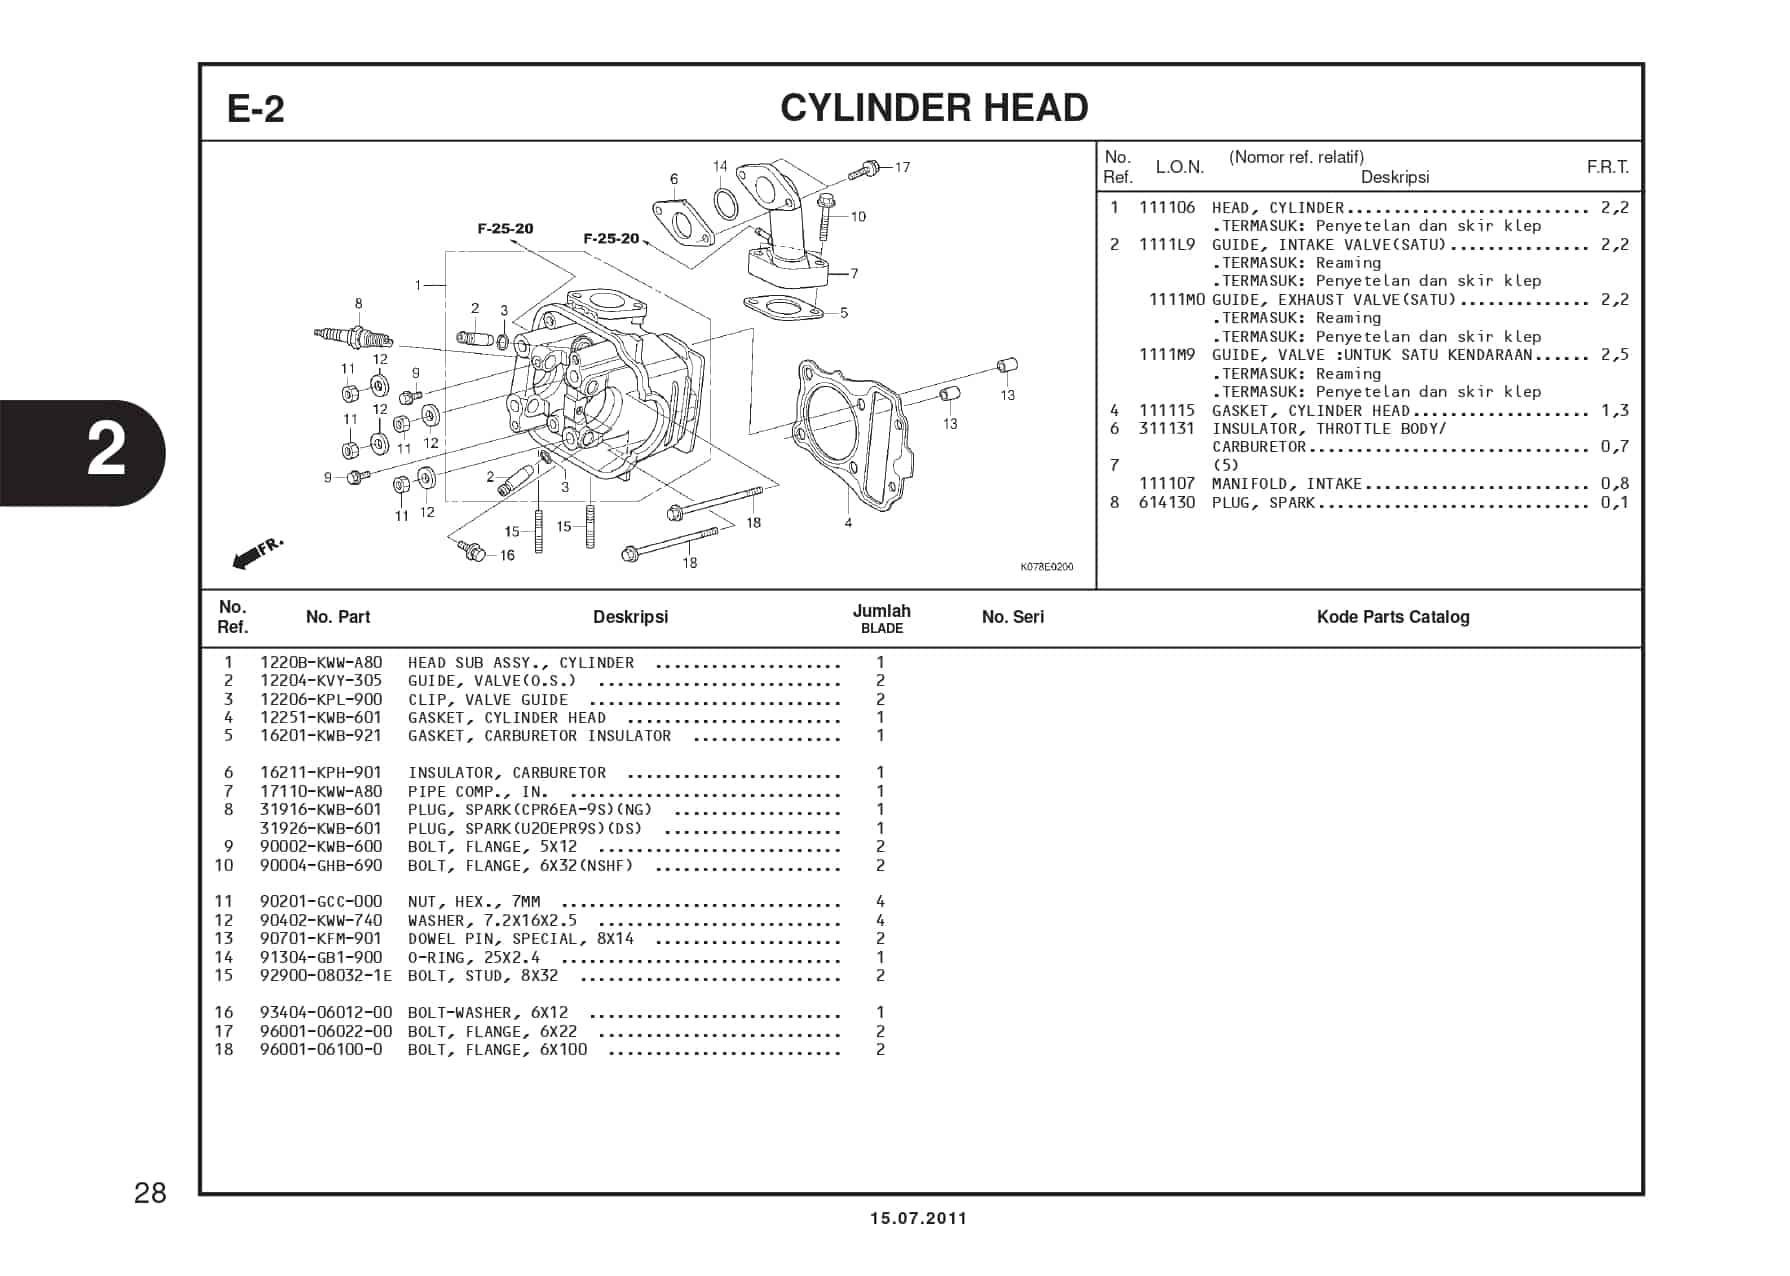 e-2 vylinder head